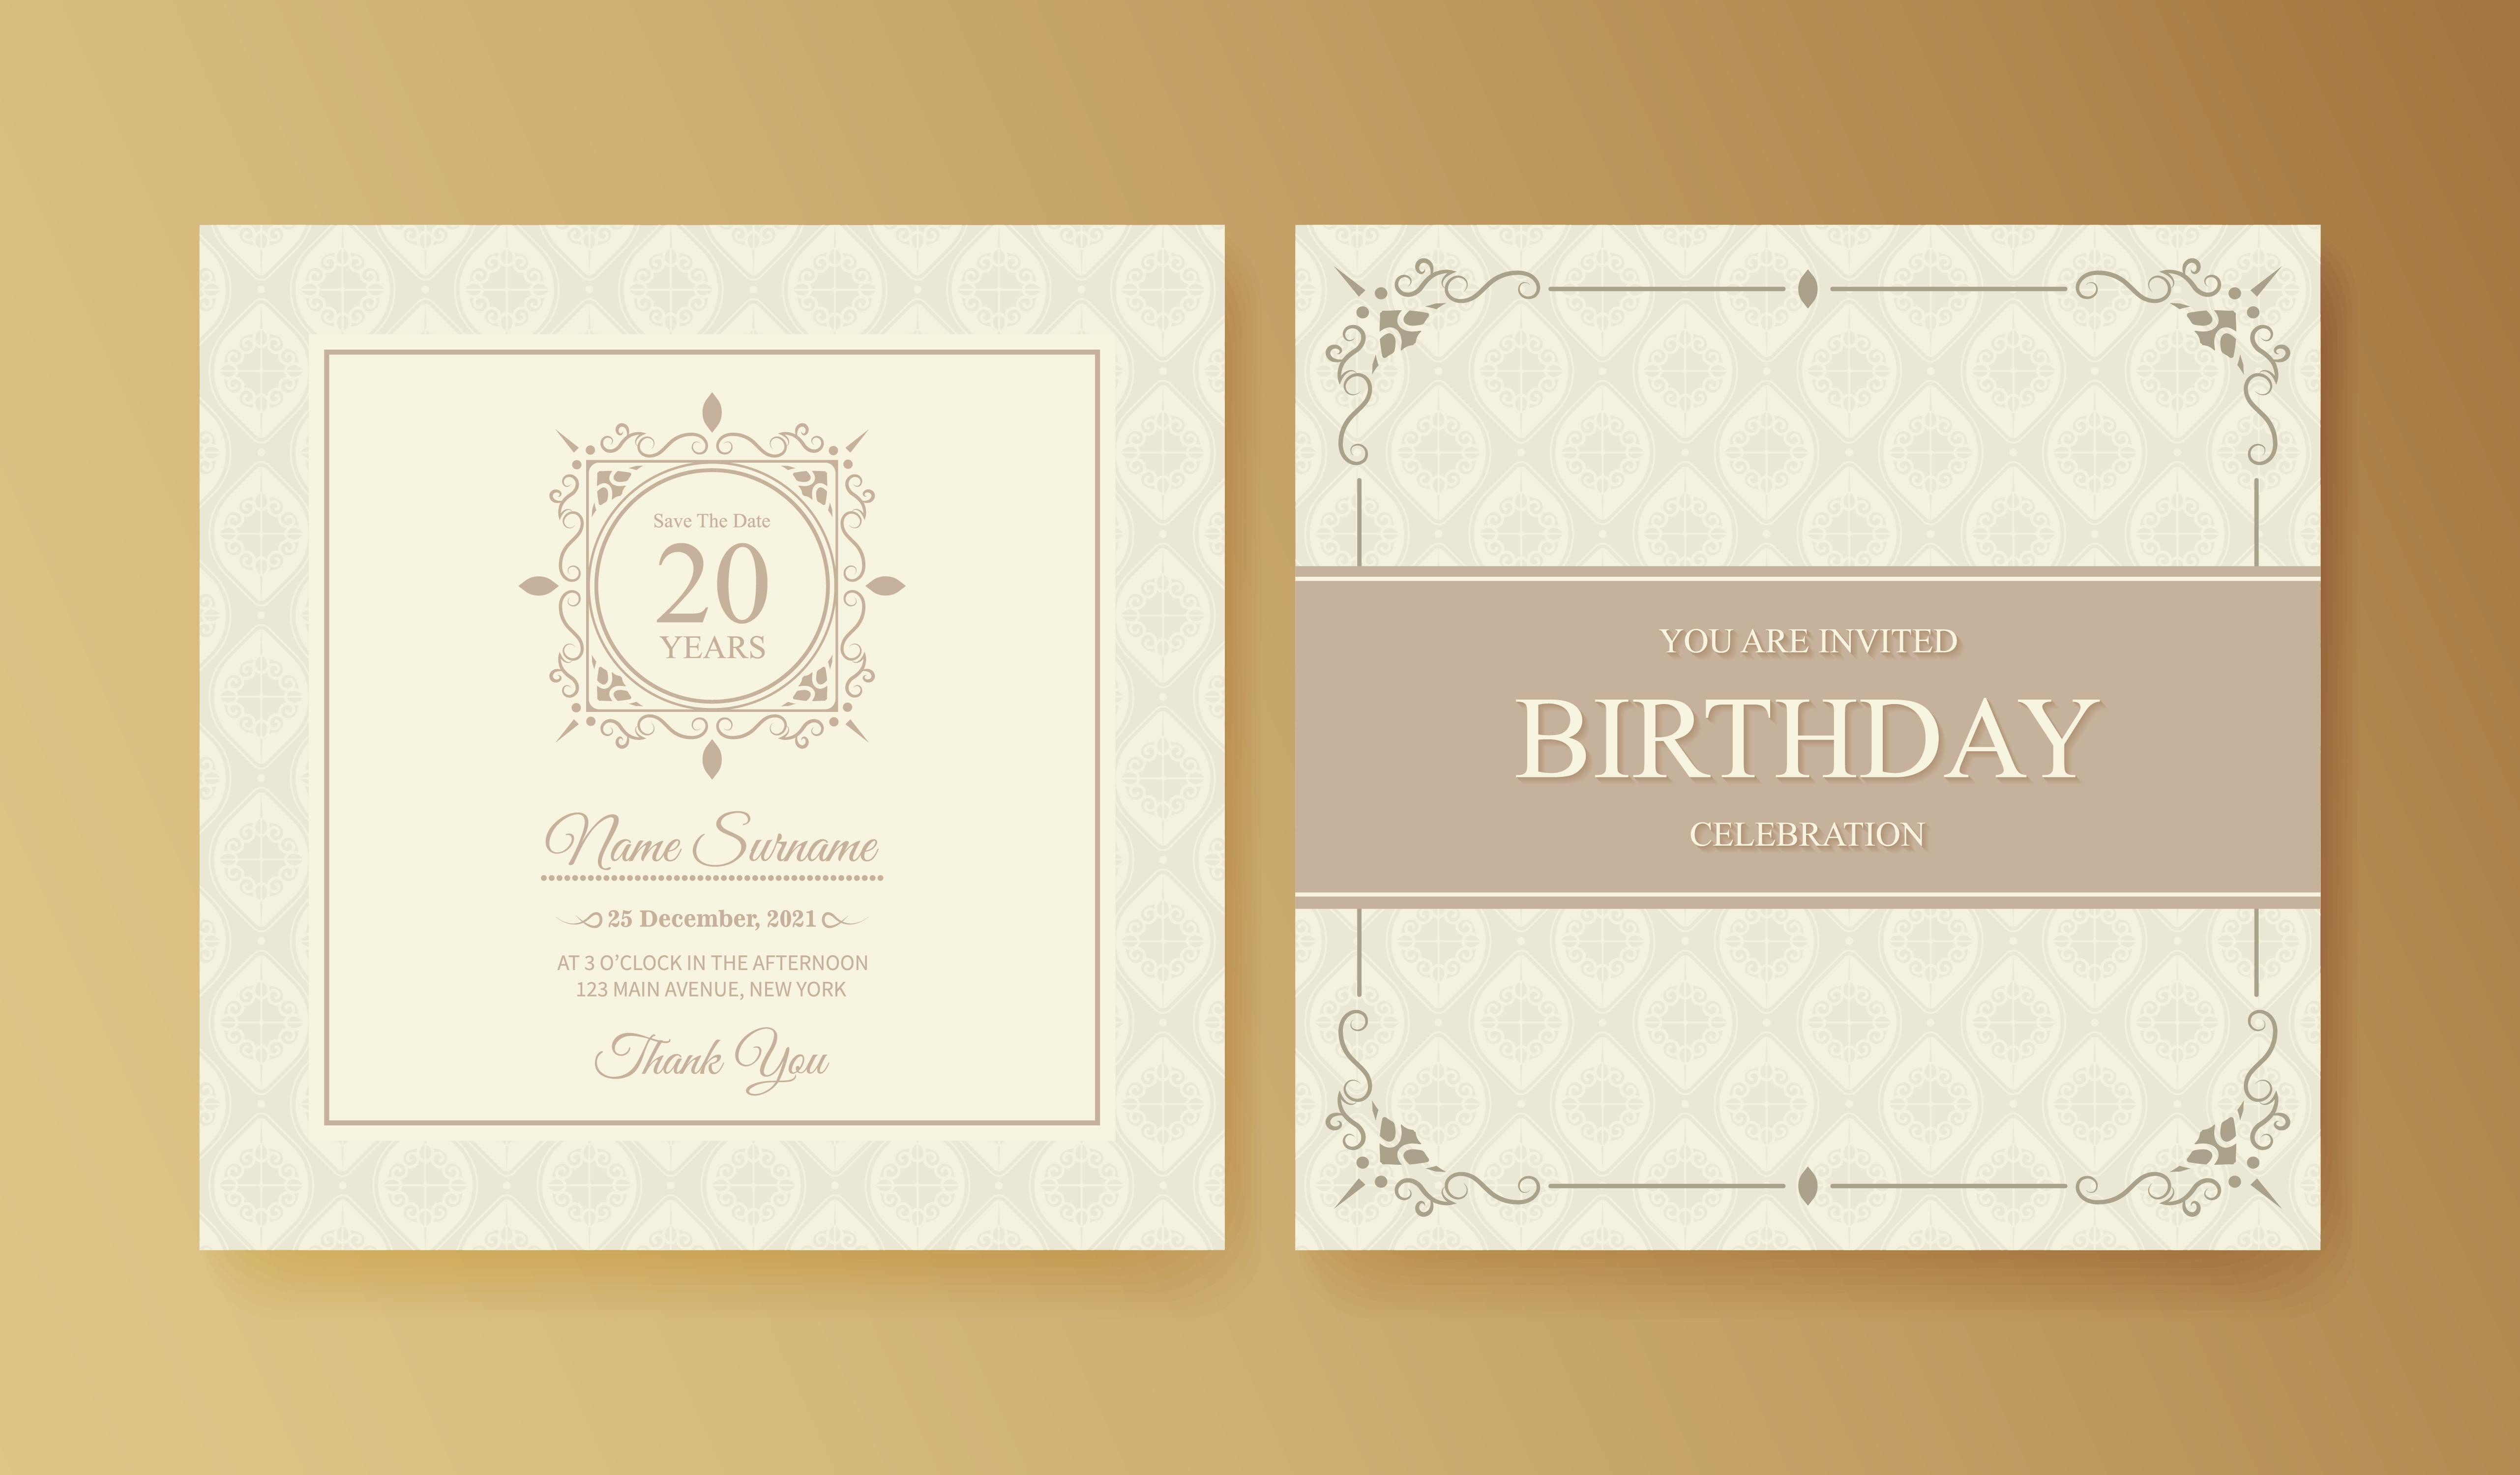 Elegant birthday invitation template - Download Free Vectors